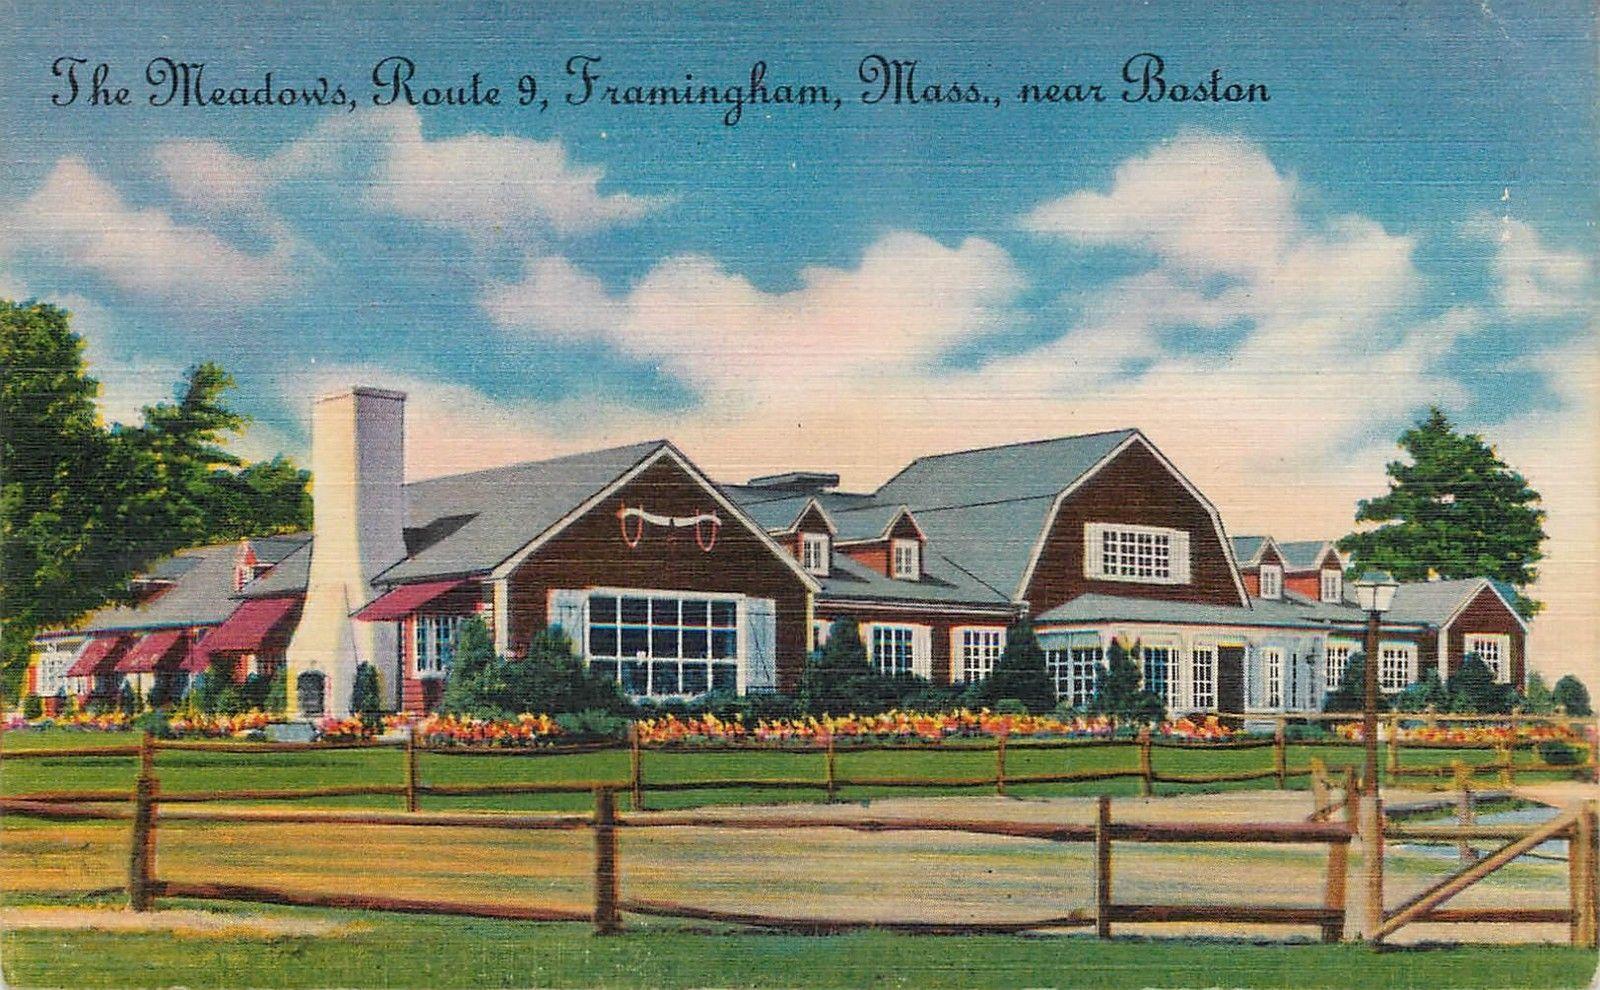 The Meadows Restaurant Route 9 Framingham Ma 1953